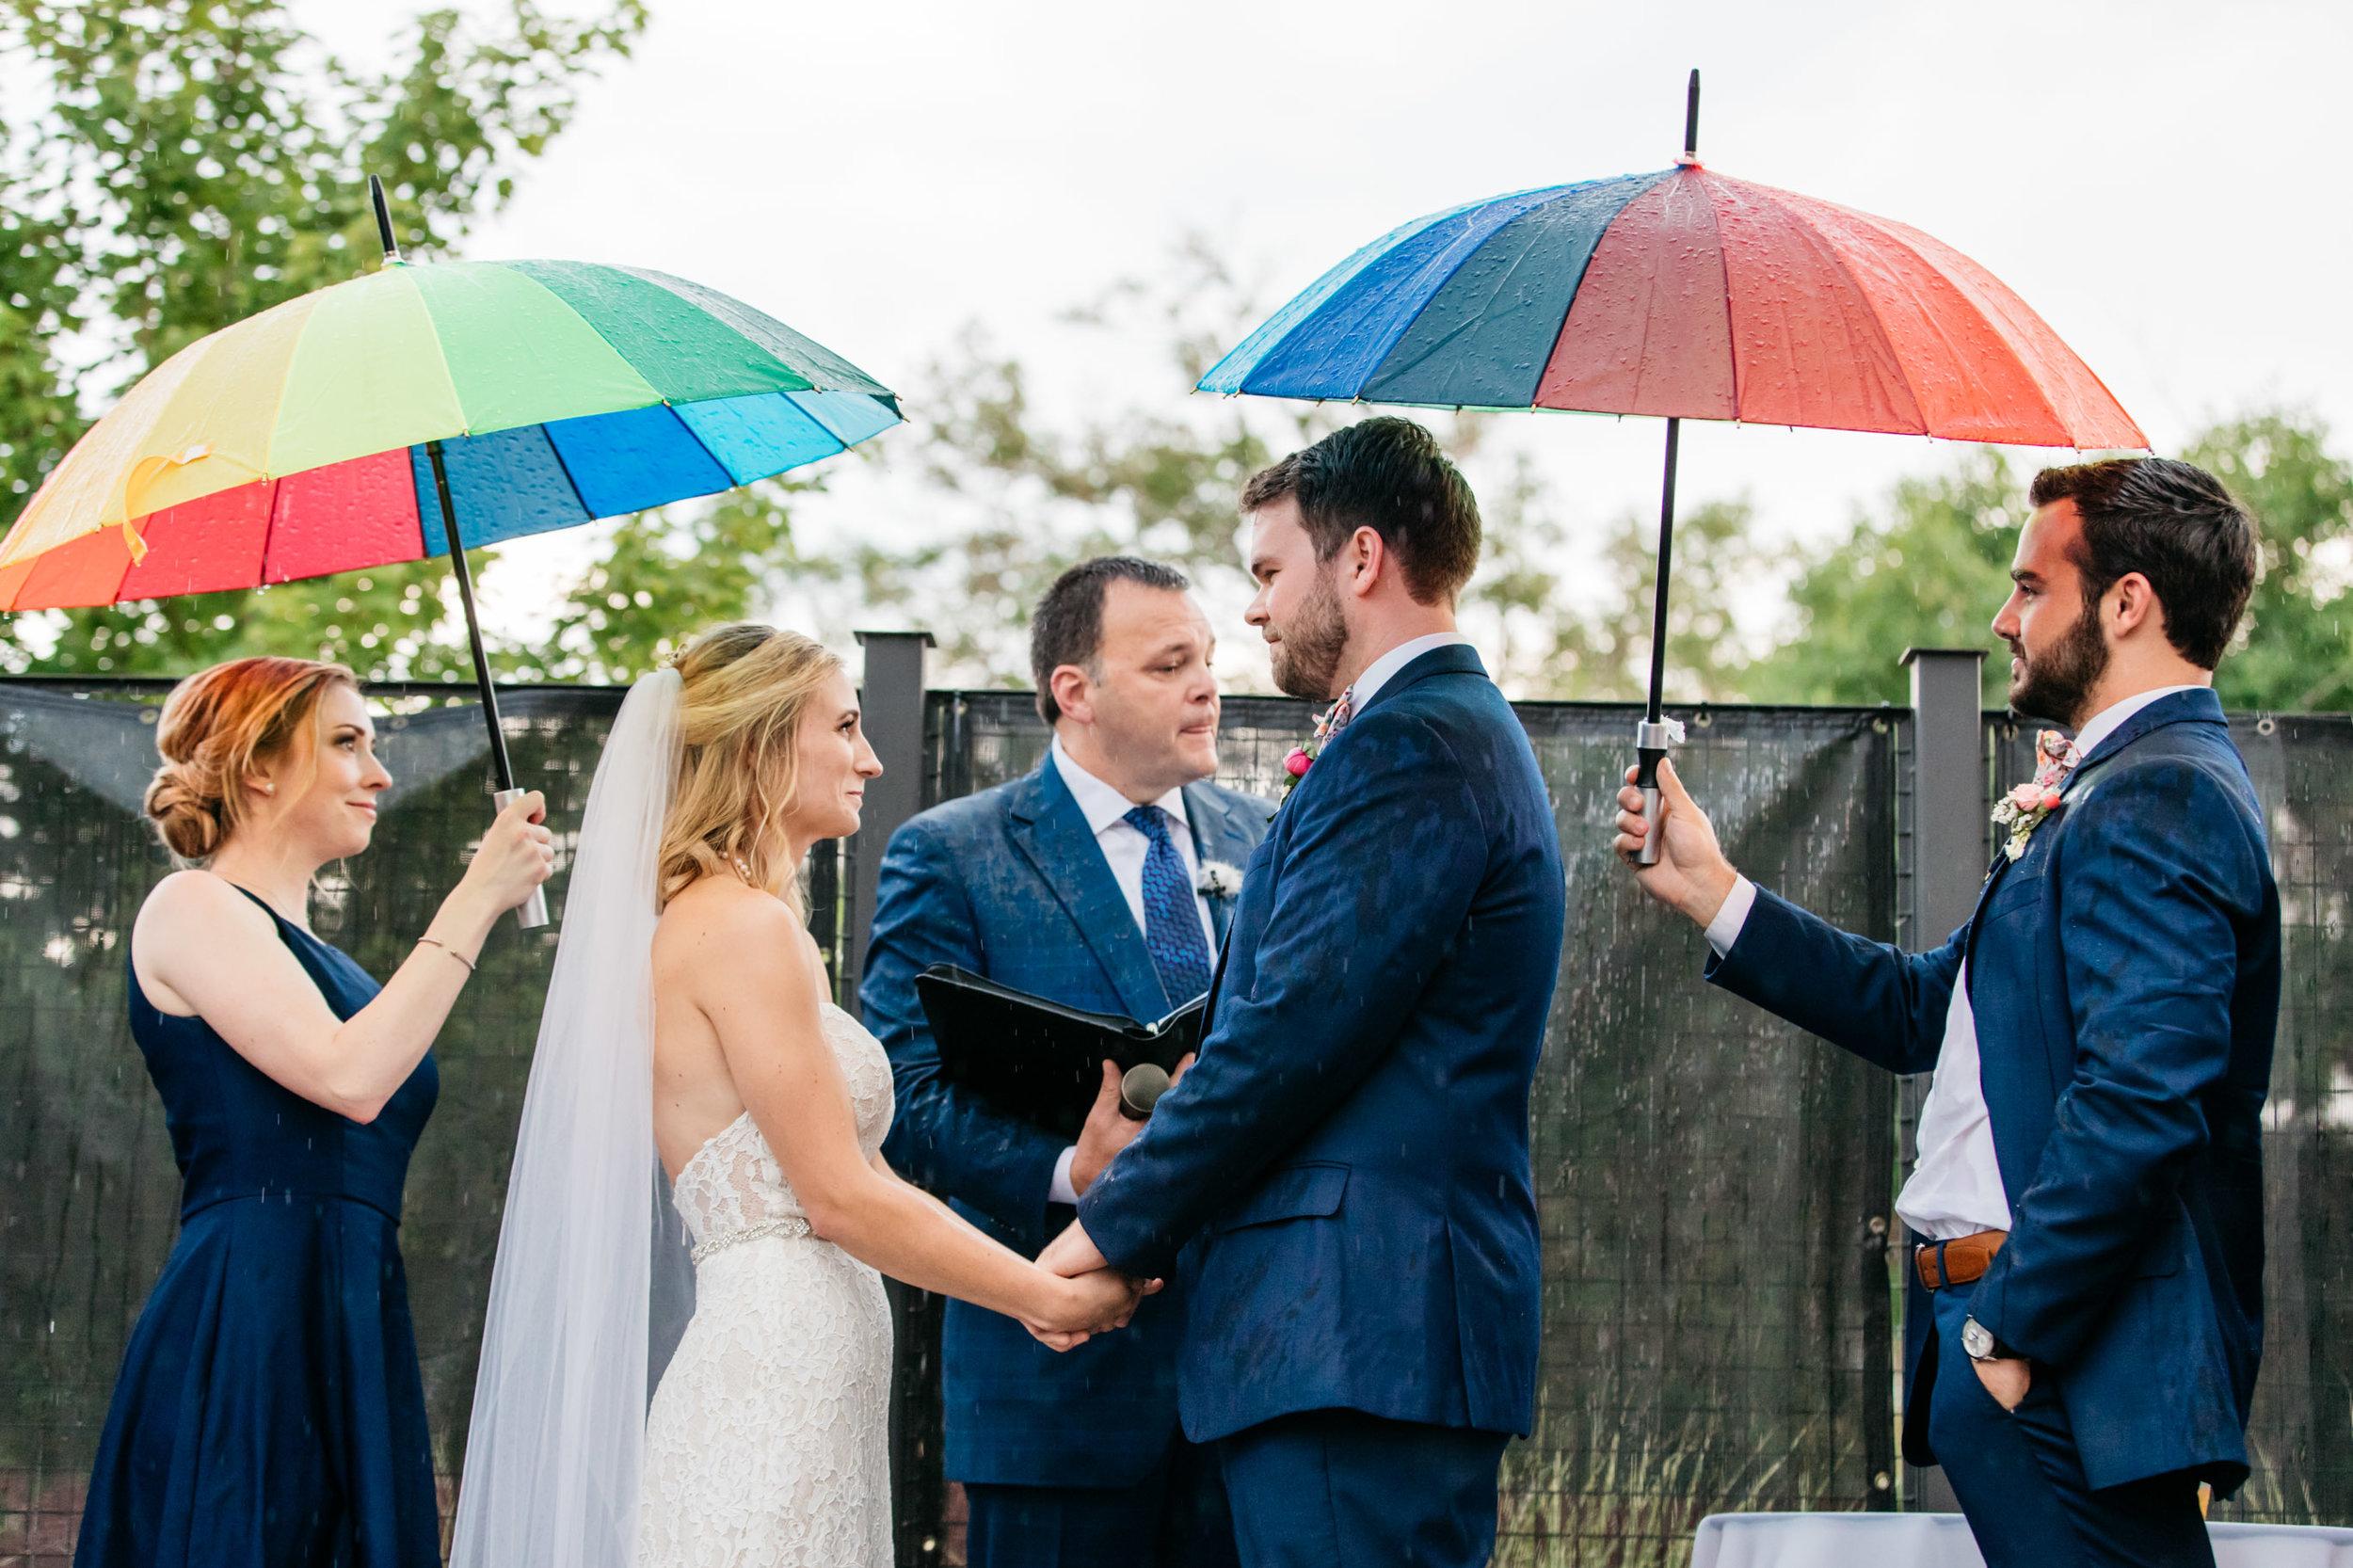 rainbow umbrellas prisma events